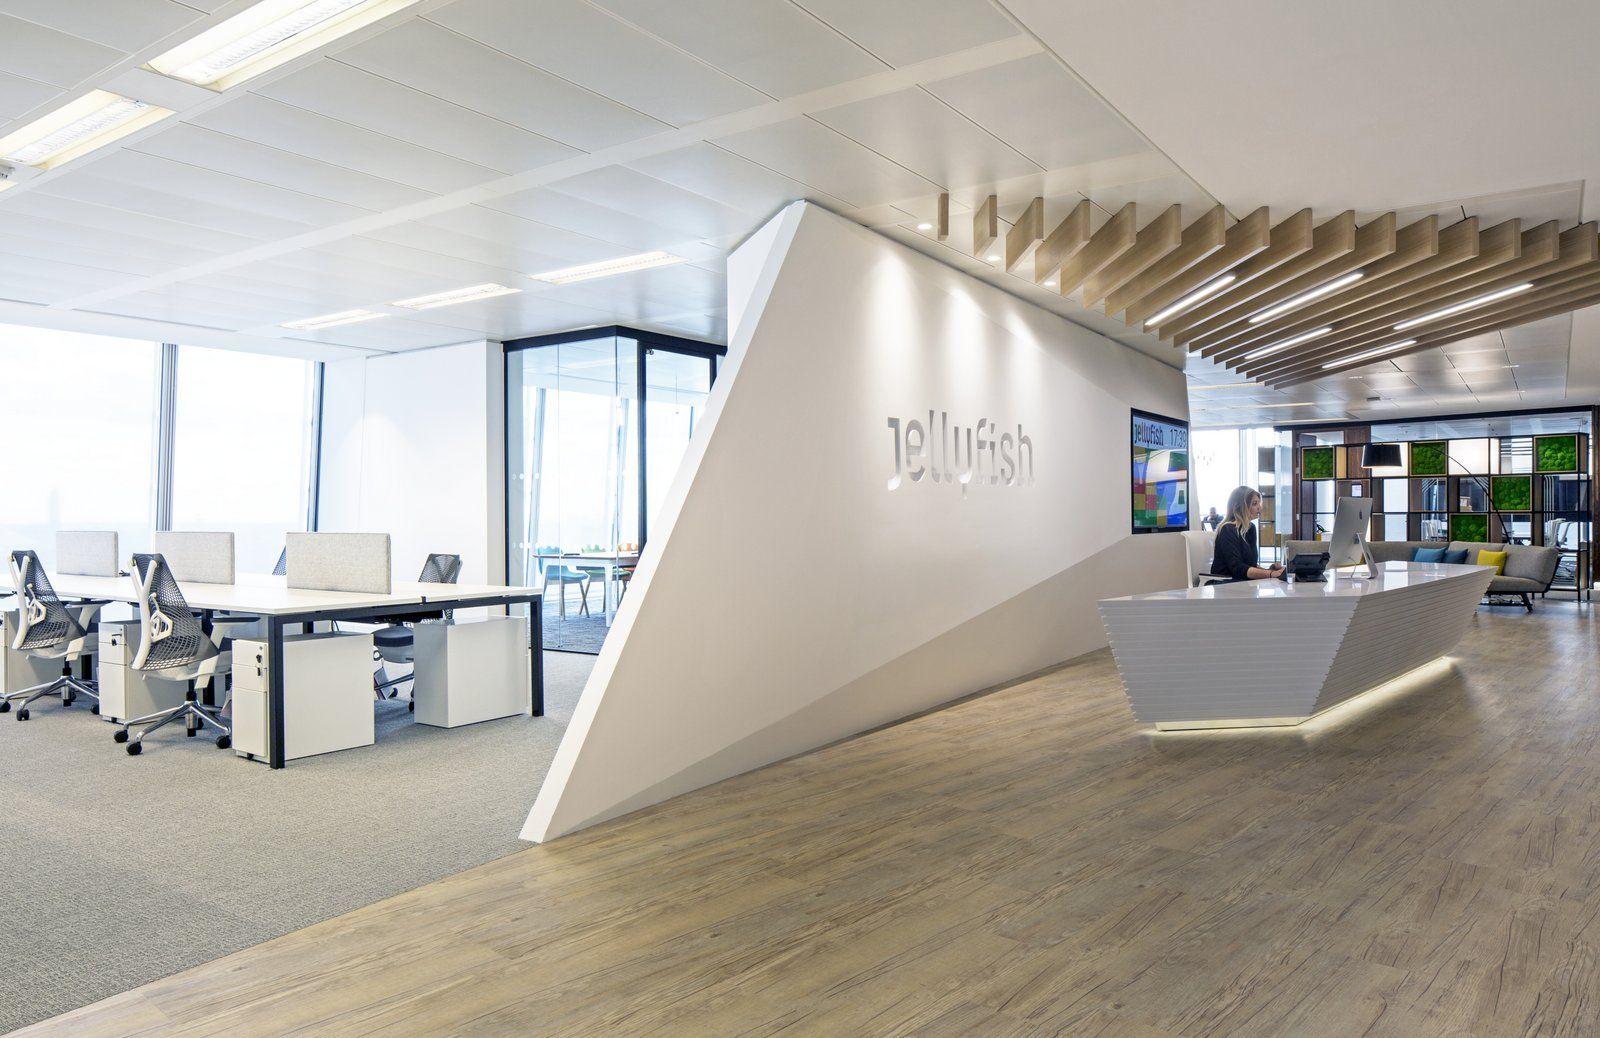 Jellyfish Offices - London - Office Snapshots | Office interior design,  Corporate office design, Corporate interior design